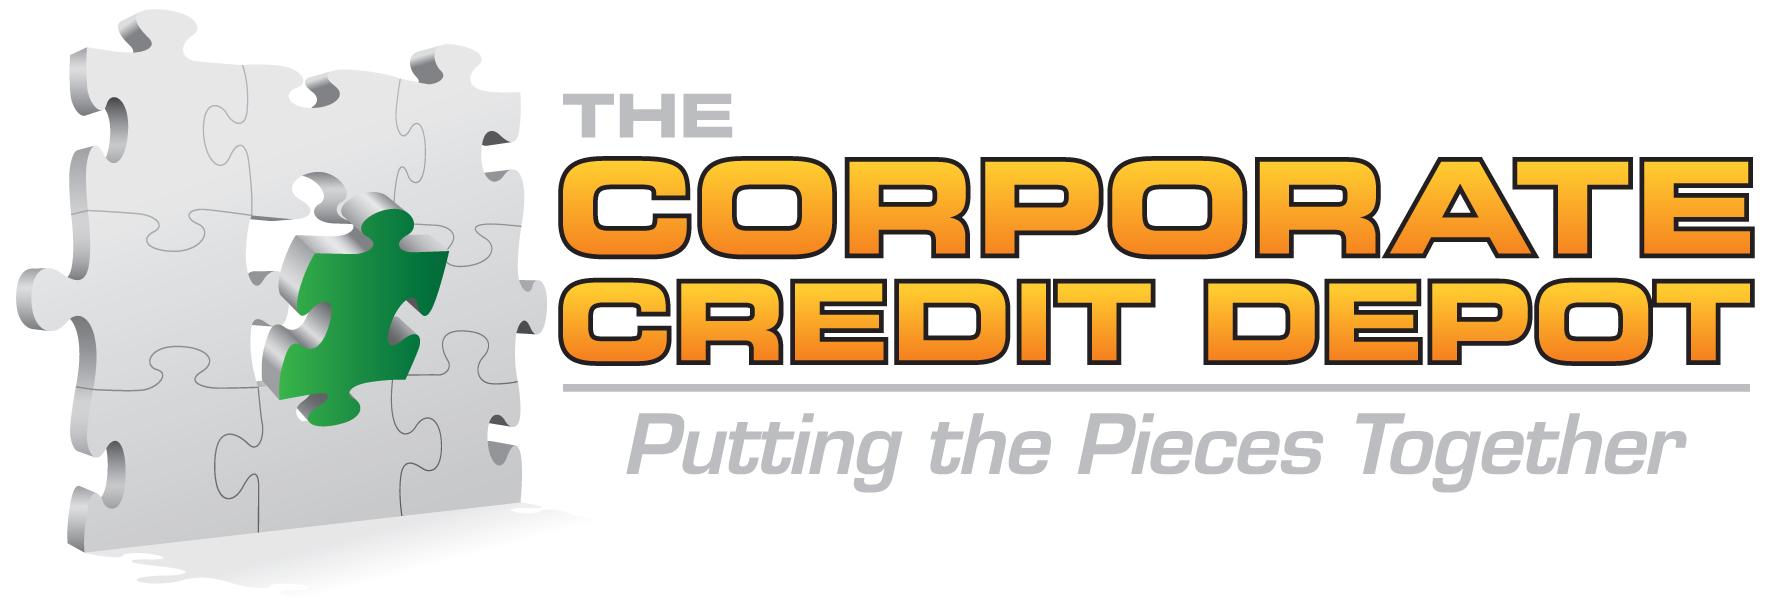 The Corporate Credit Depot in Laguna Hills, CA, 25602 Alicia Pkwy ...